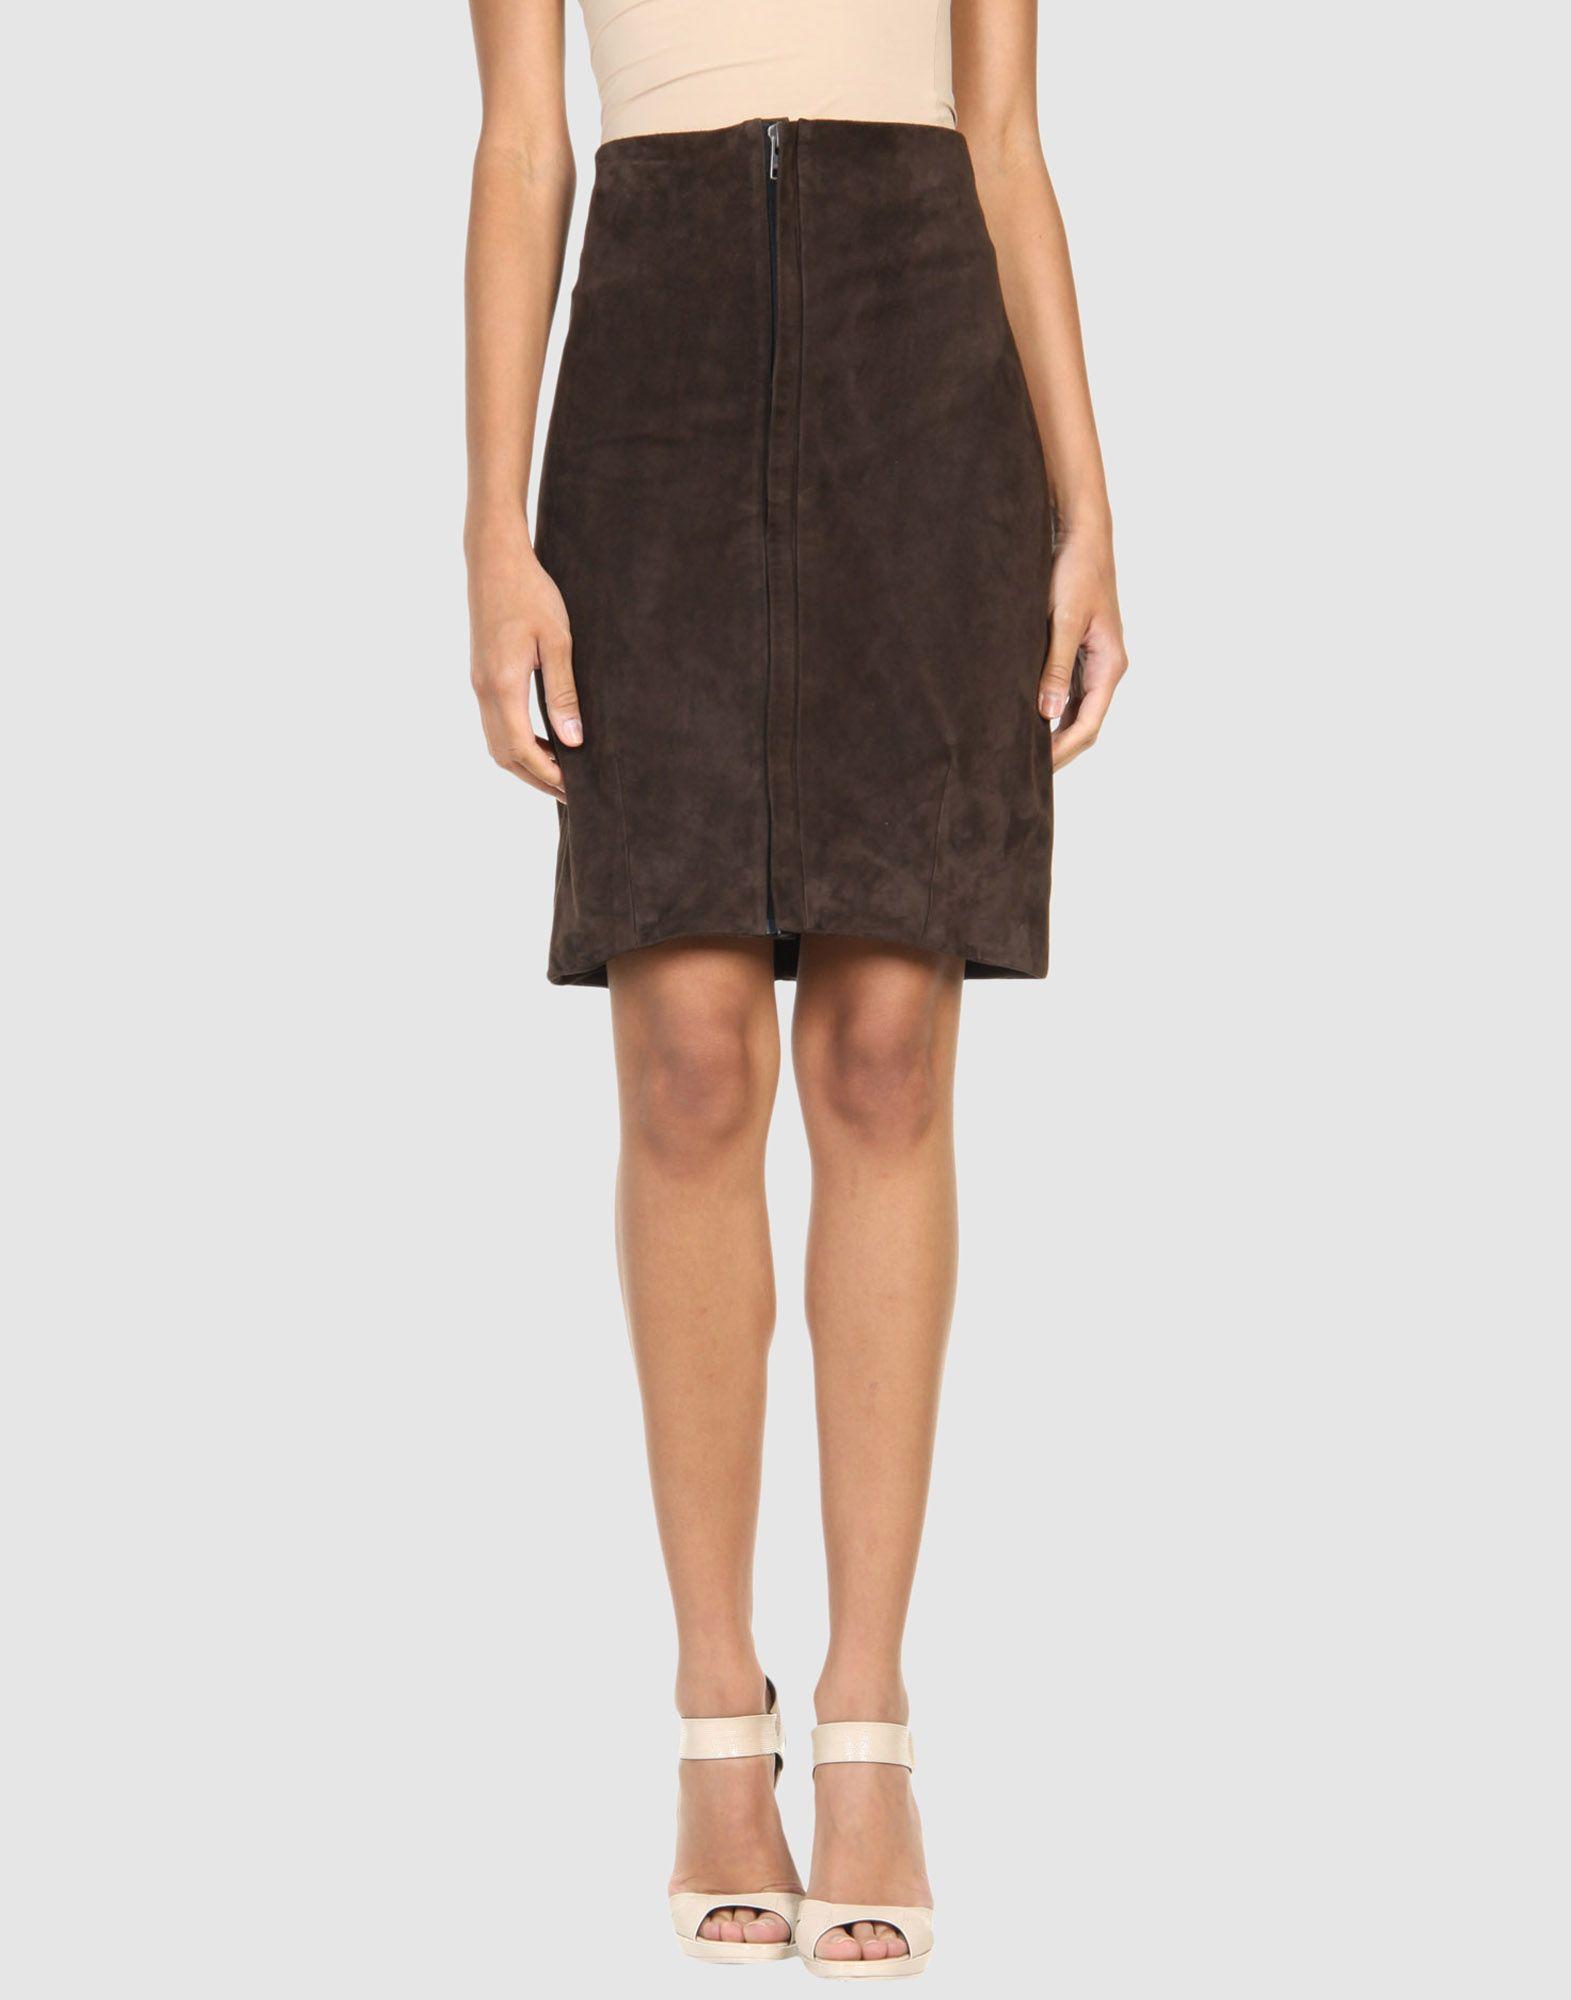 haider ackermann leather skirt in brown brown